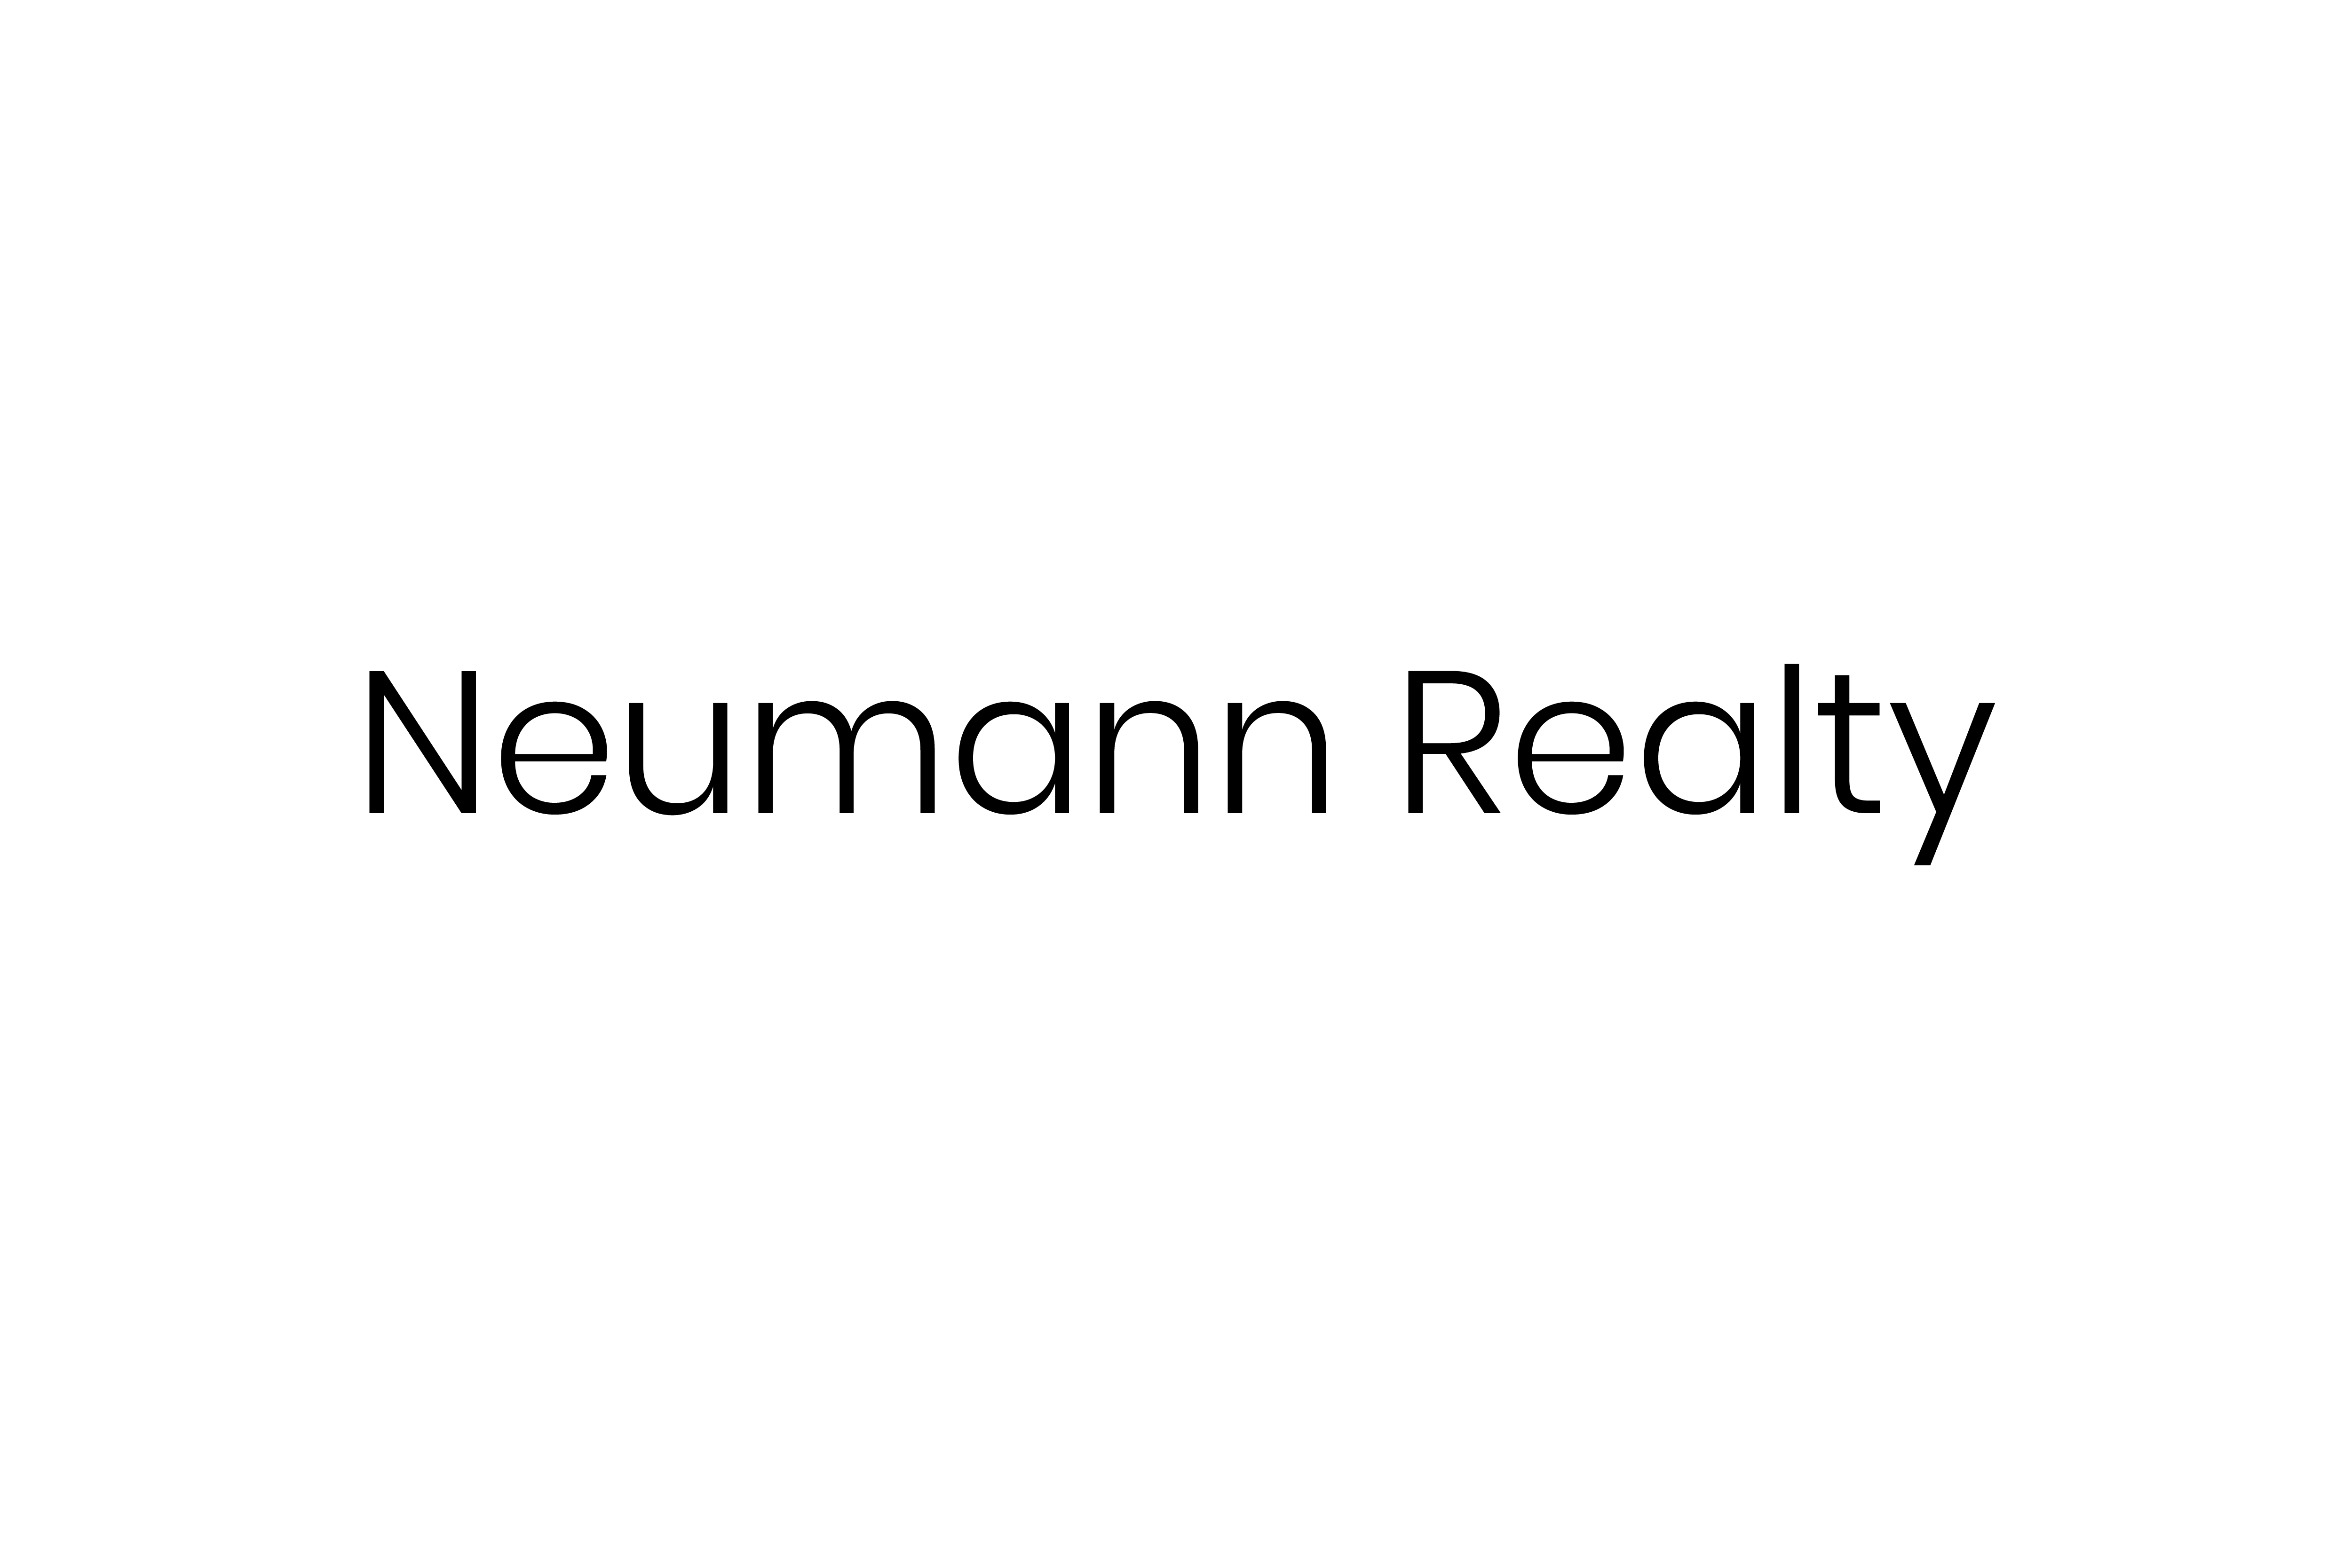 Neumann Realty Corp. logo